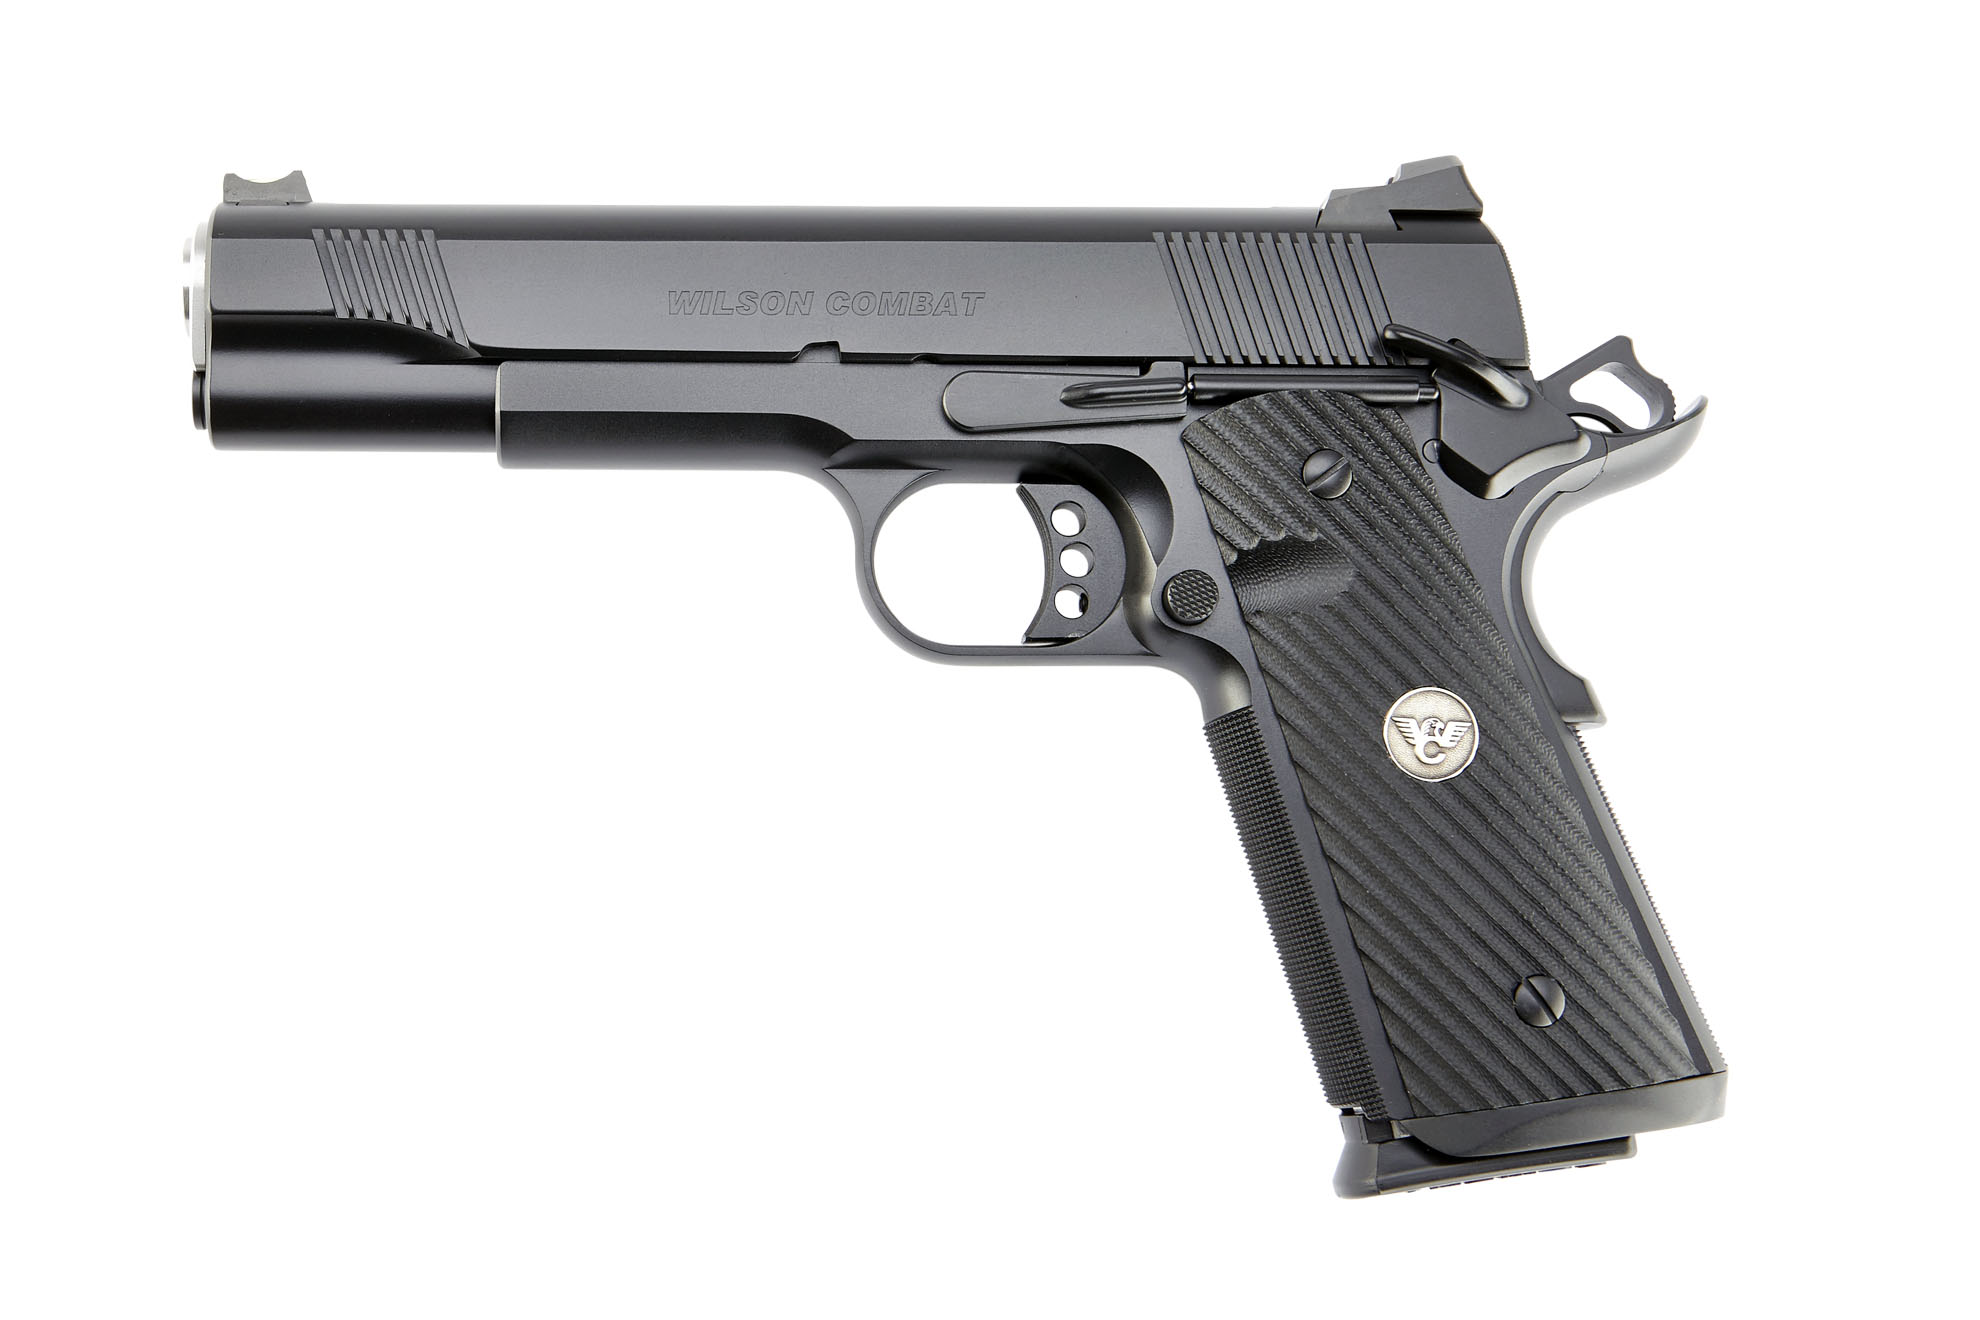 Wilson Combat CQB Elite Full Size, 45ACP - Black